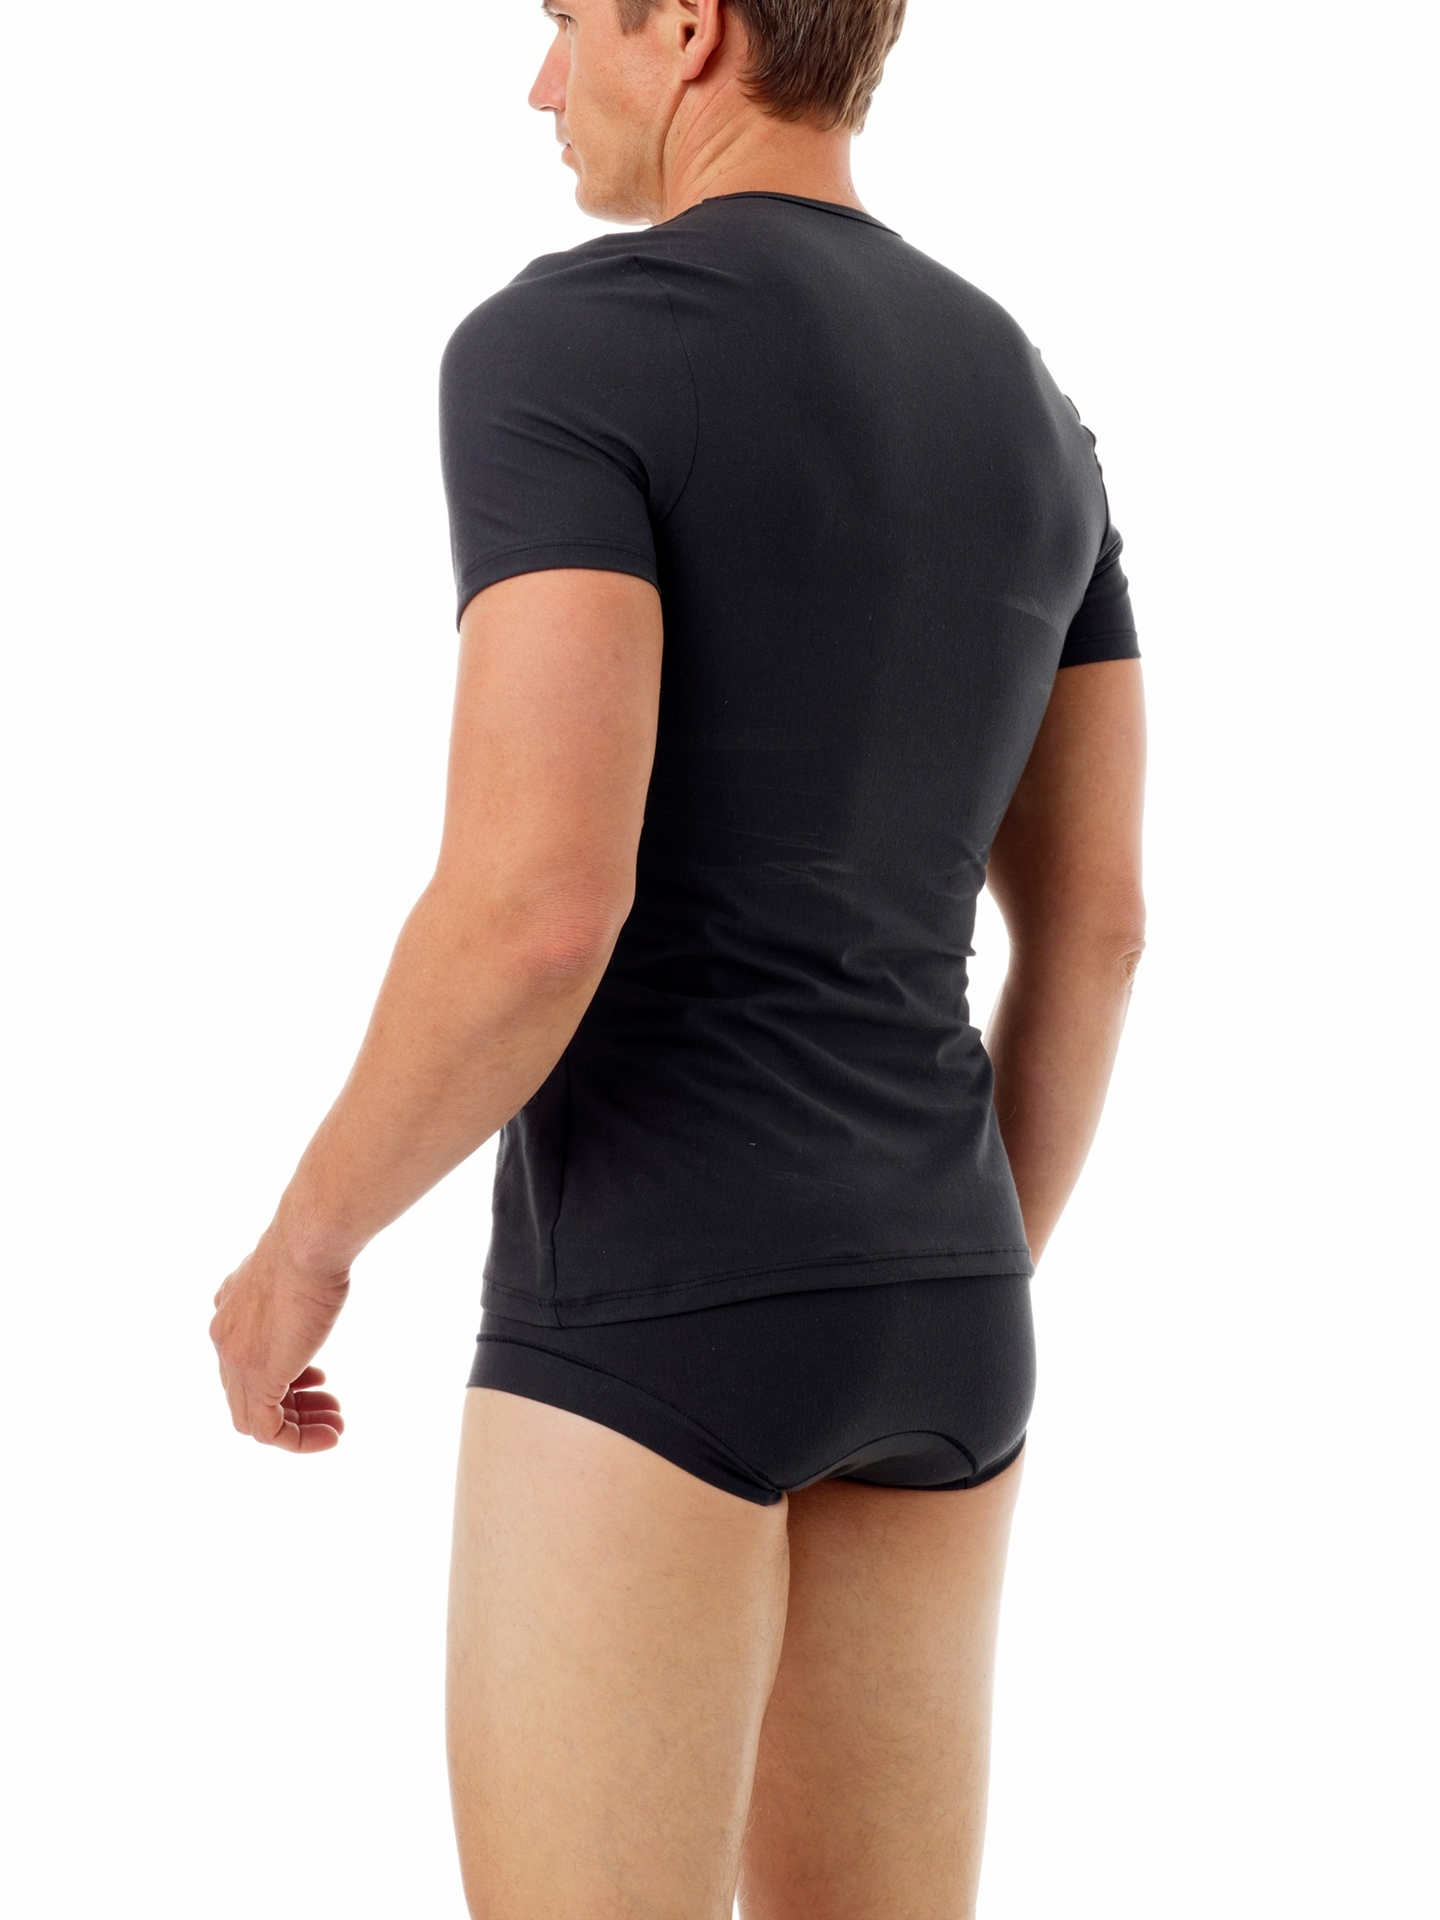 Picture of MagiCotton V-Neck Compression Shirt for Men